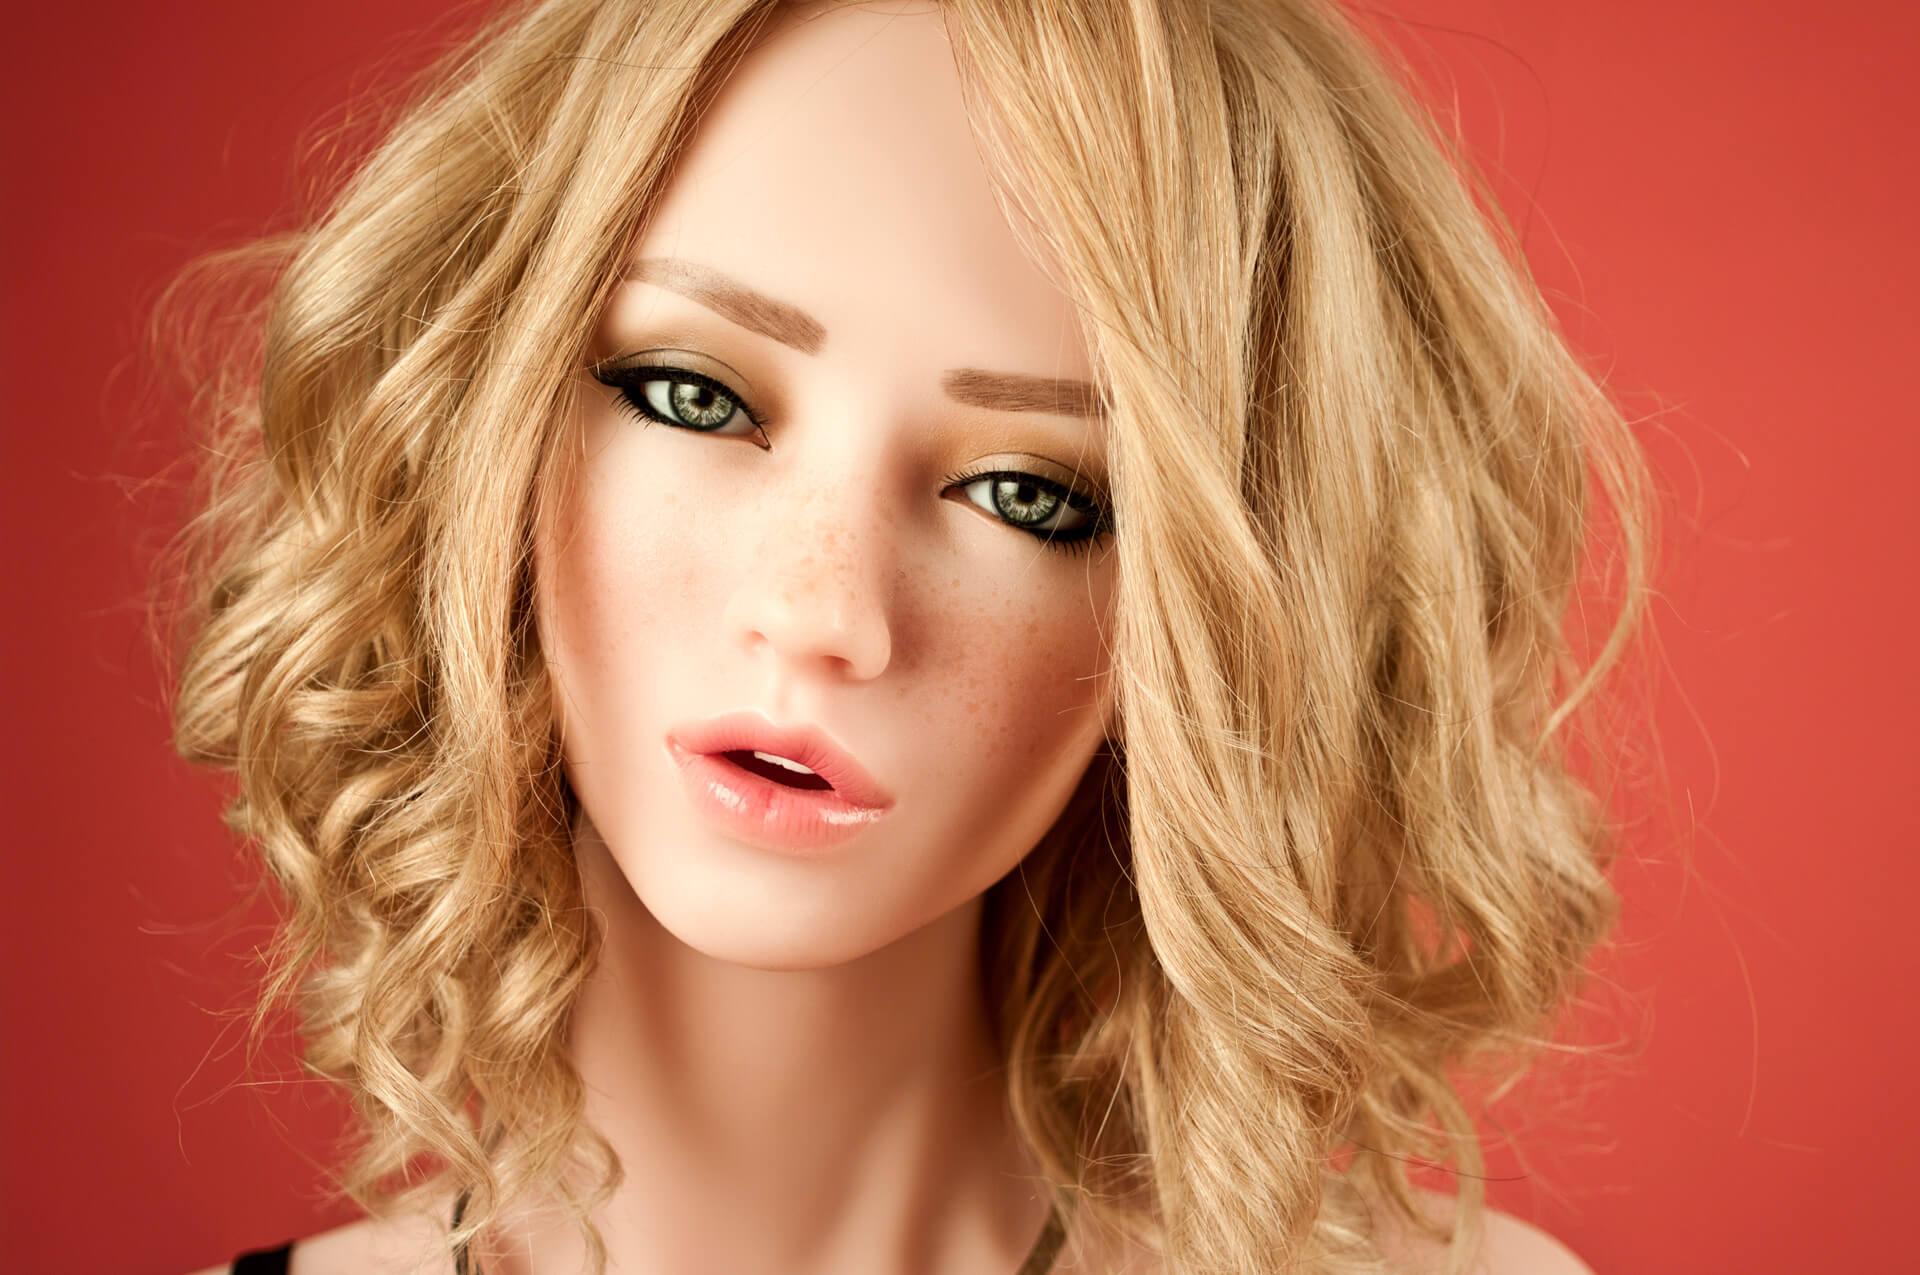 4woods Europe Silicone Dolls Marina Head A Western Beauty